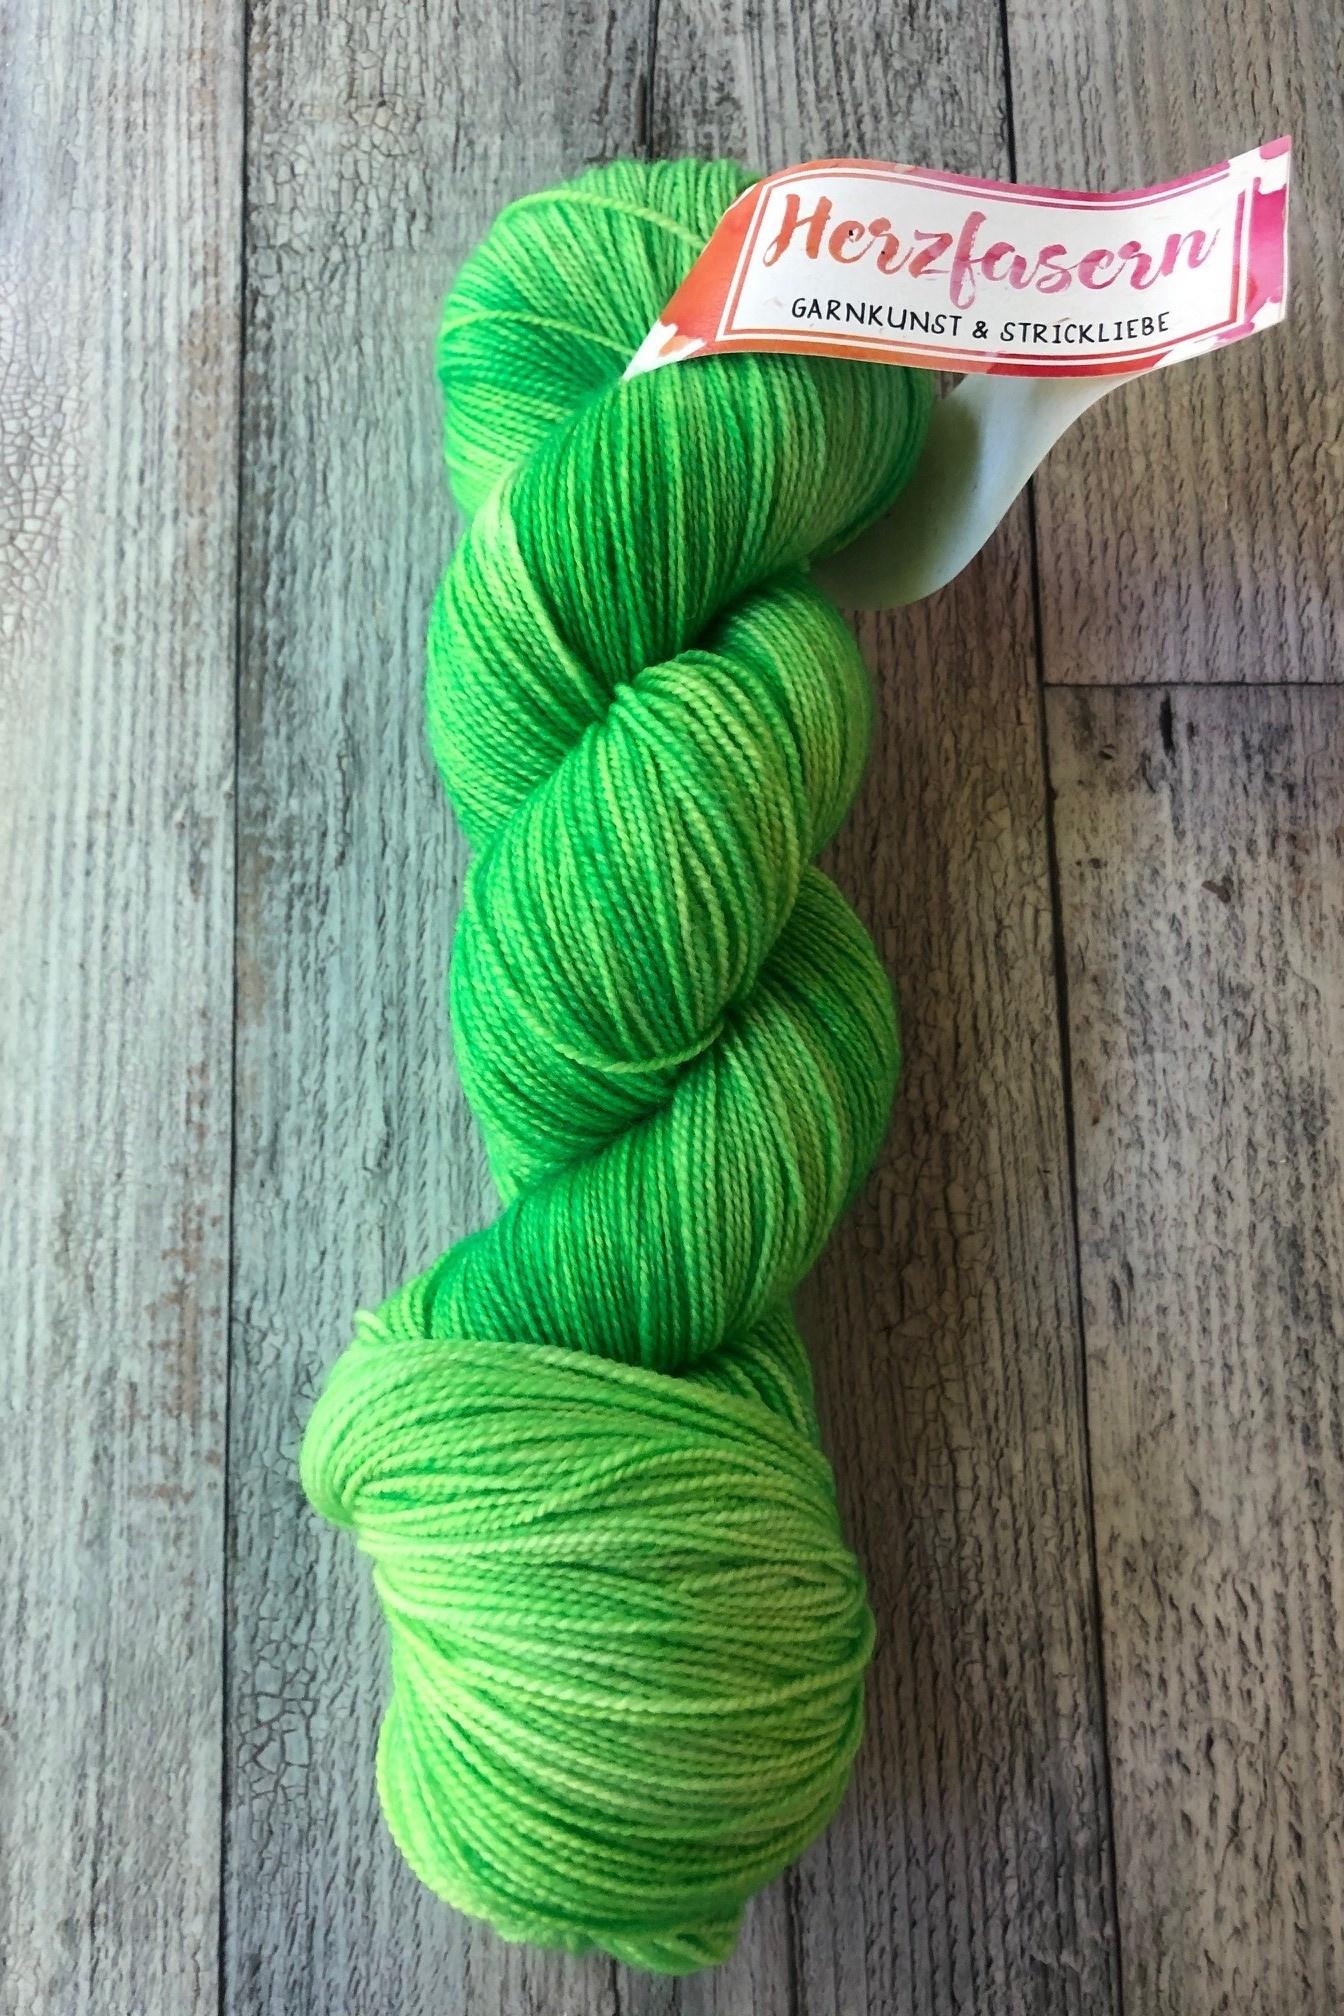 Herzfasern Lace Merino 600 -Kermit